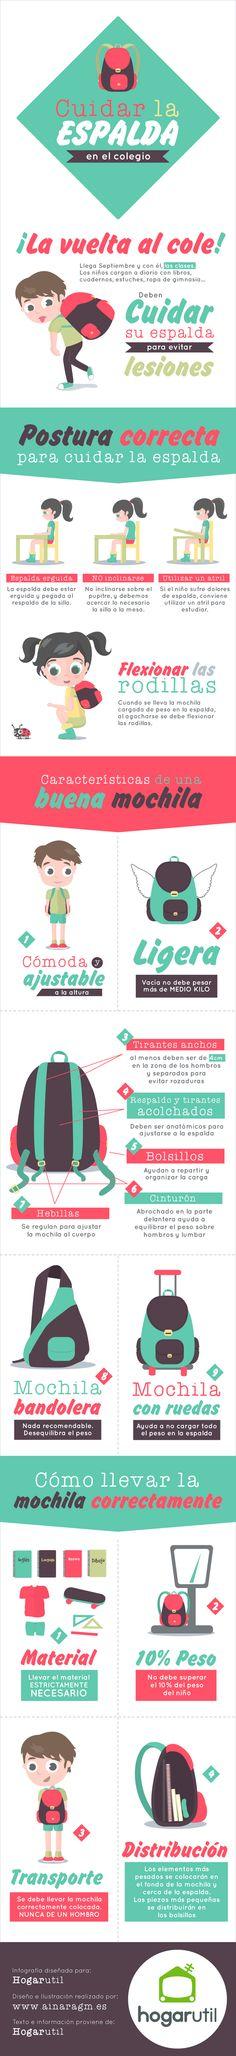 4_info_cuidar_espalda